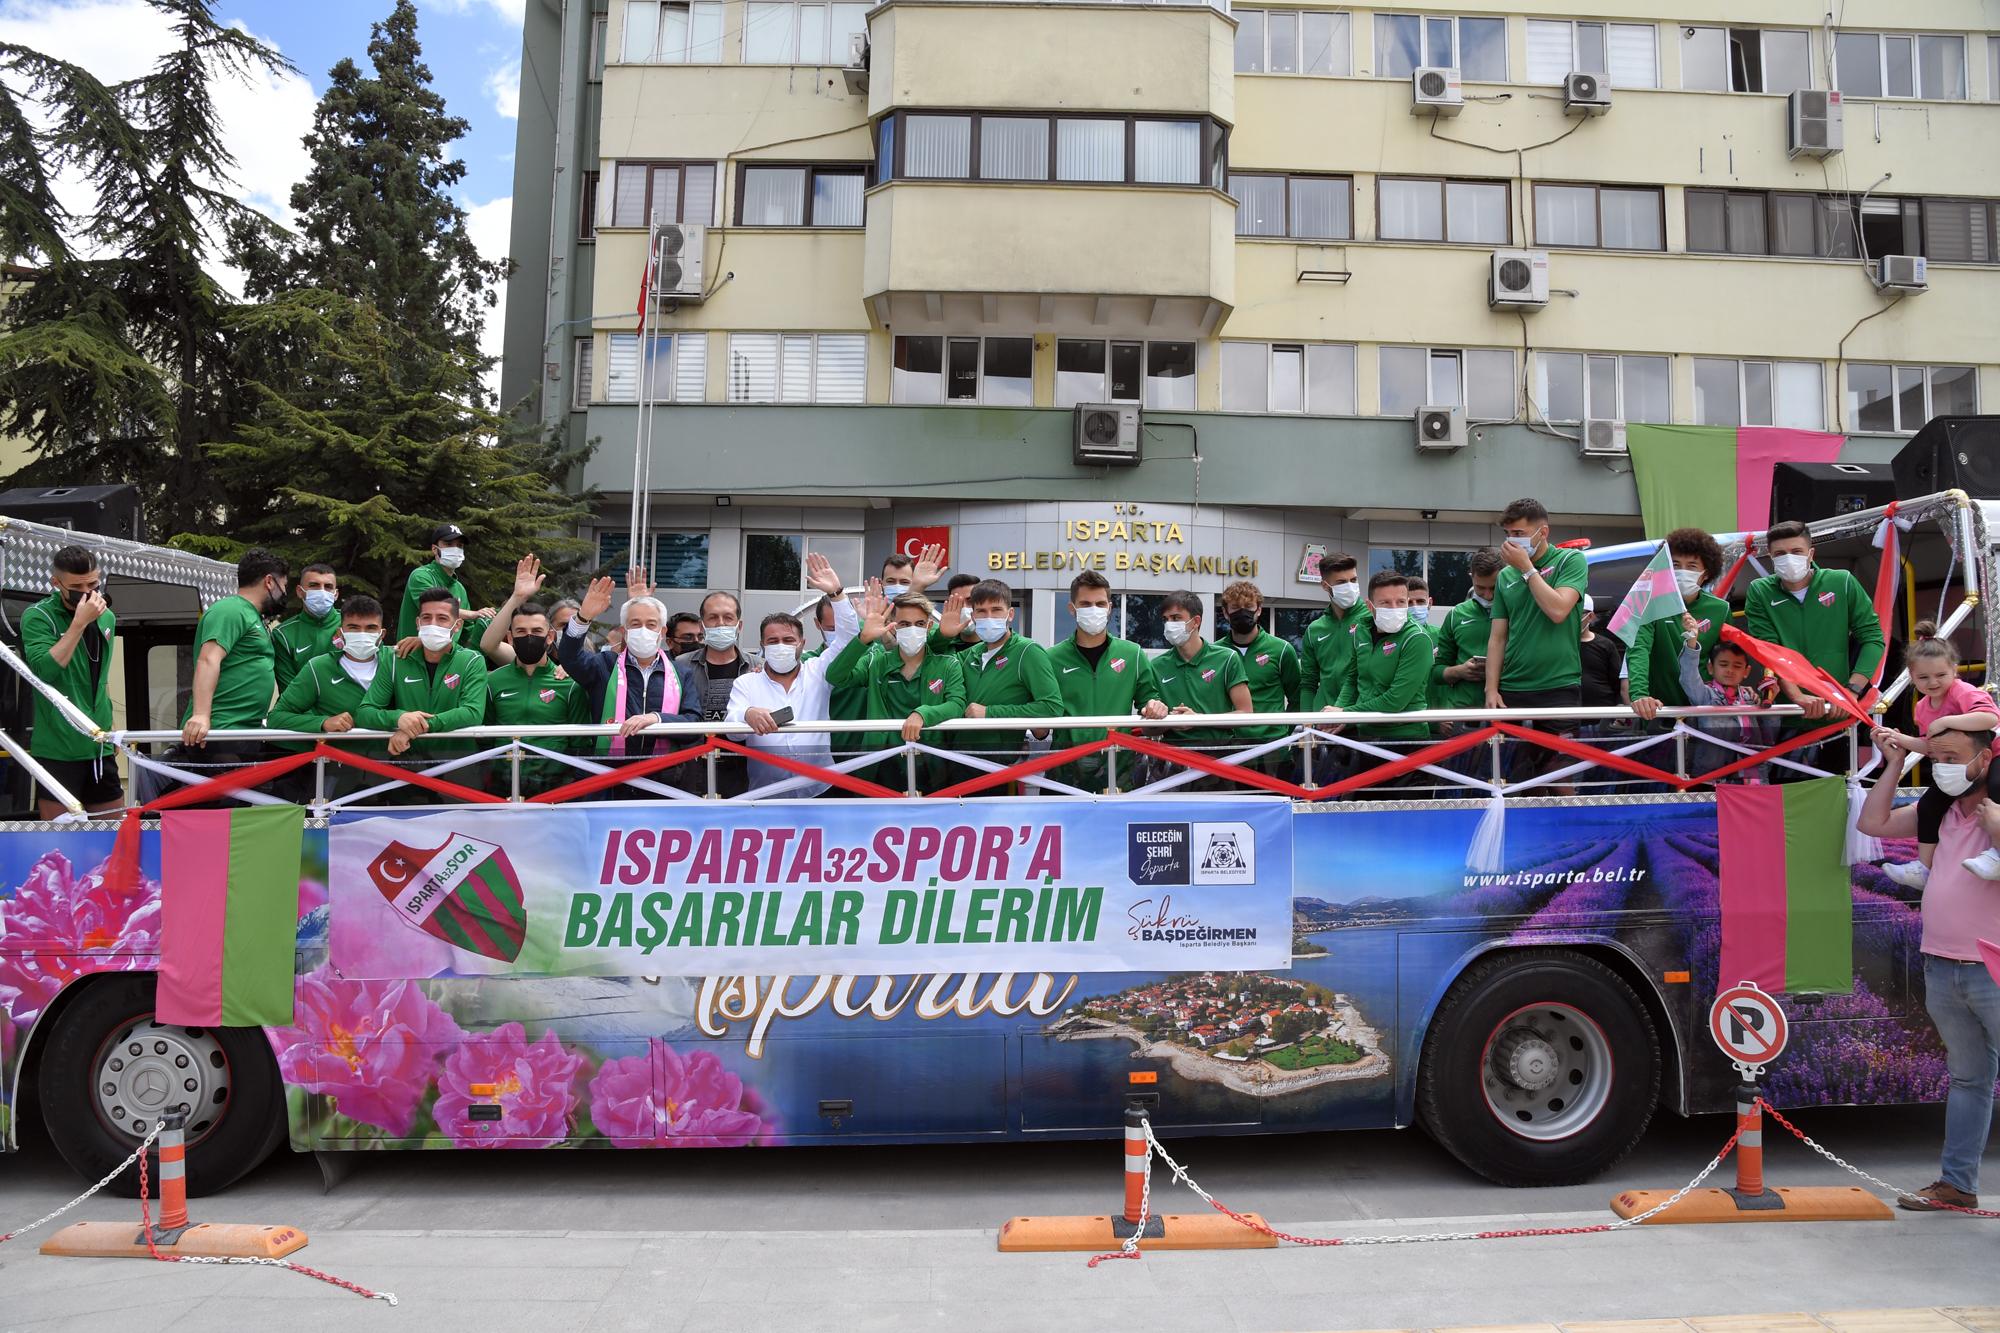 22-05-2021-ispartaspor-eskisehir-baskan-1